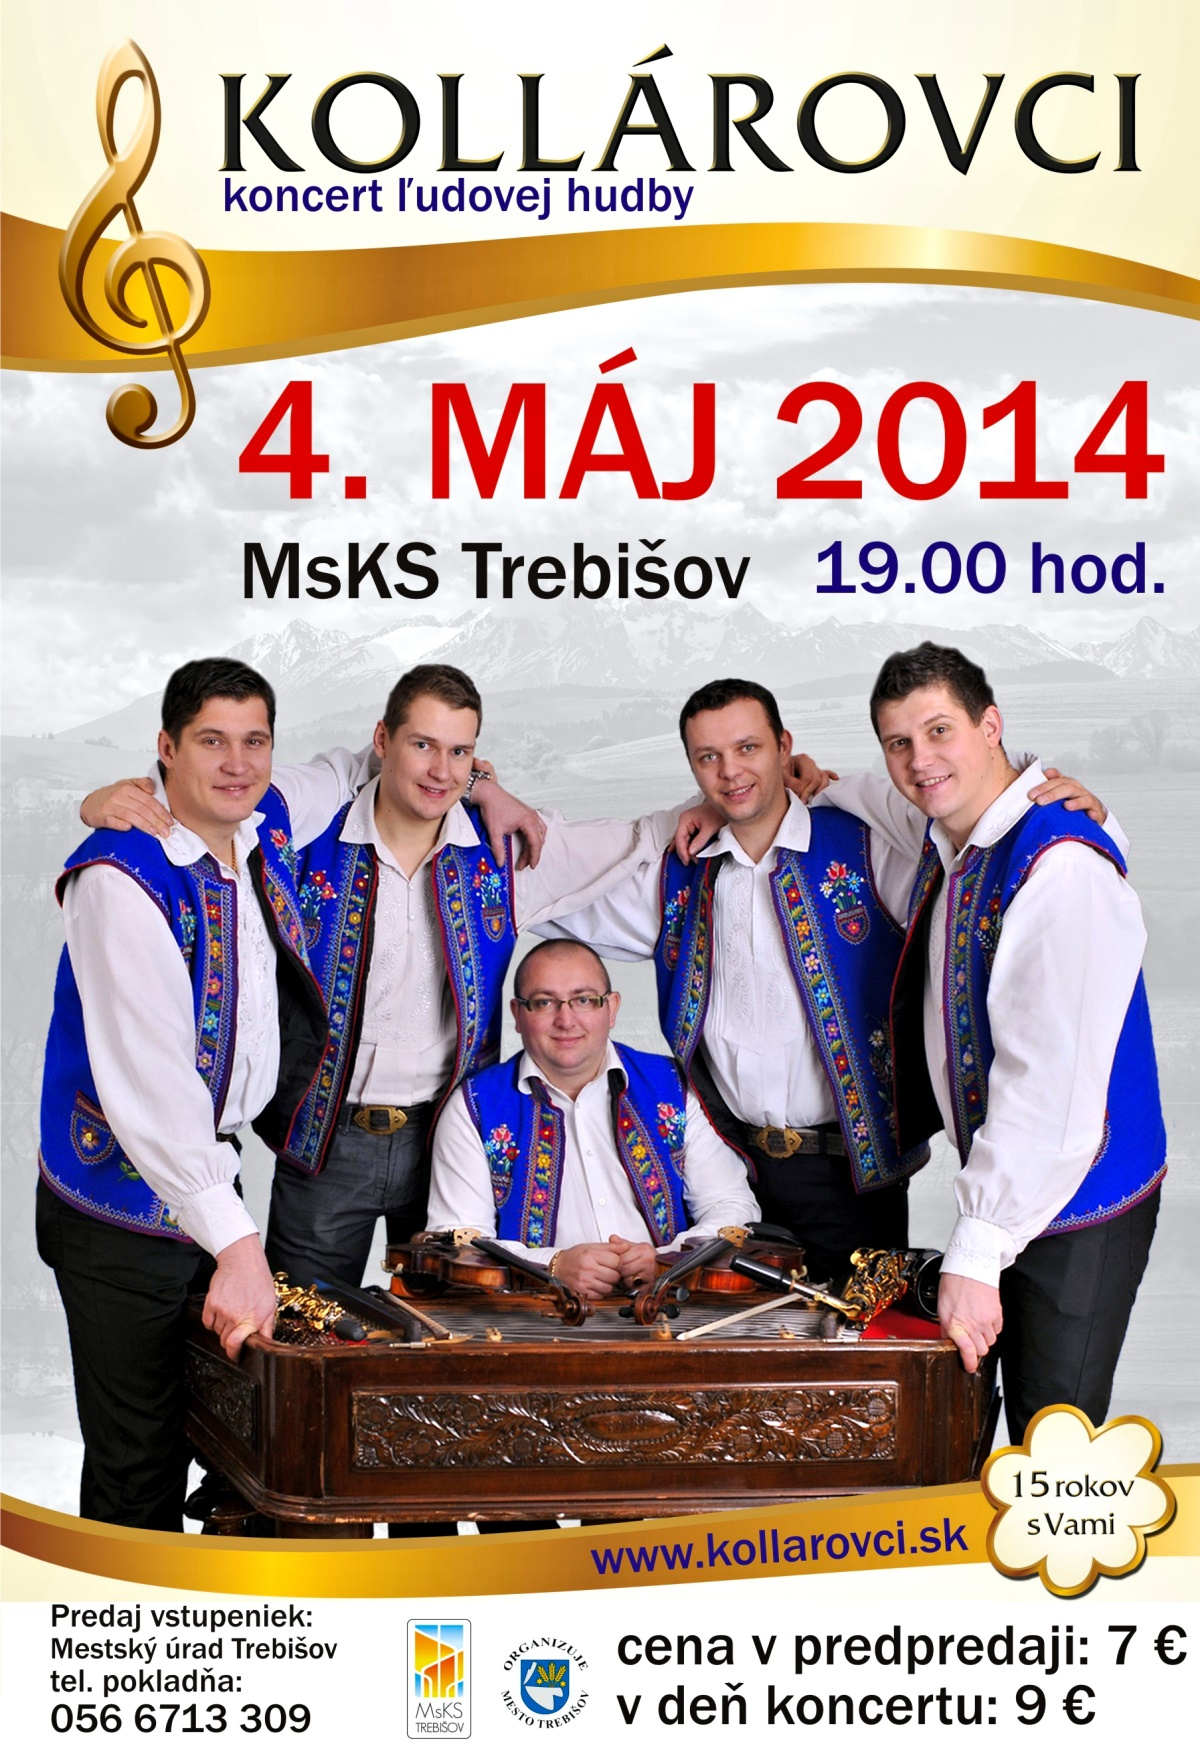 00 Kollarovci. Slovakia. 20.12.14